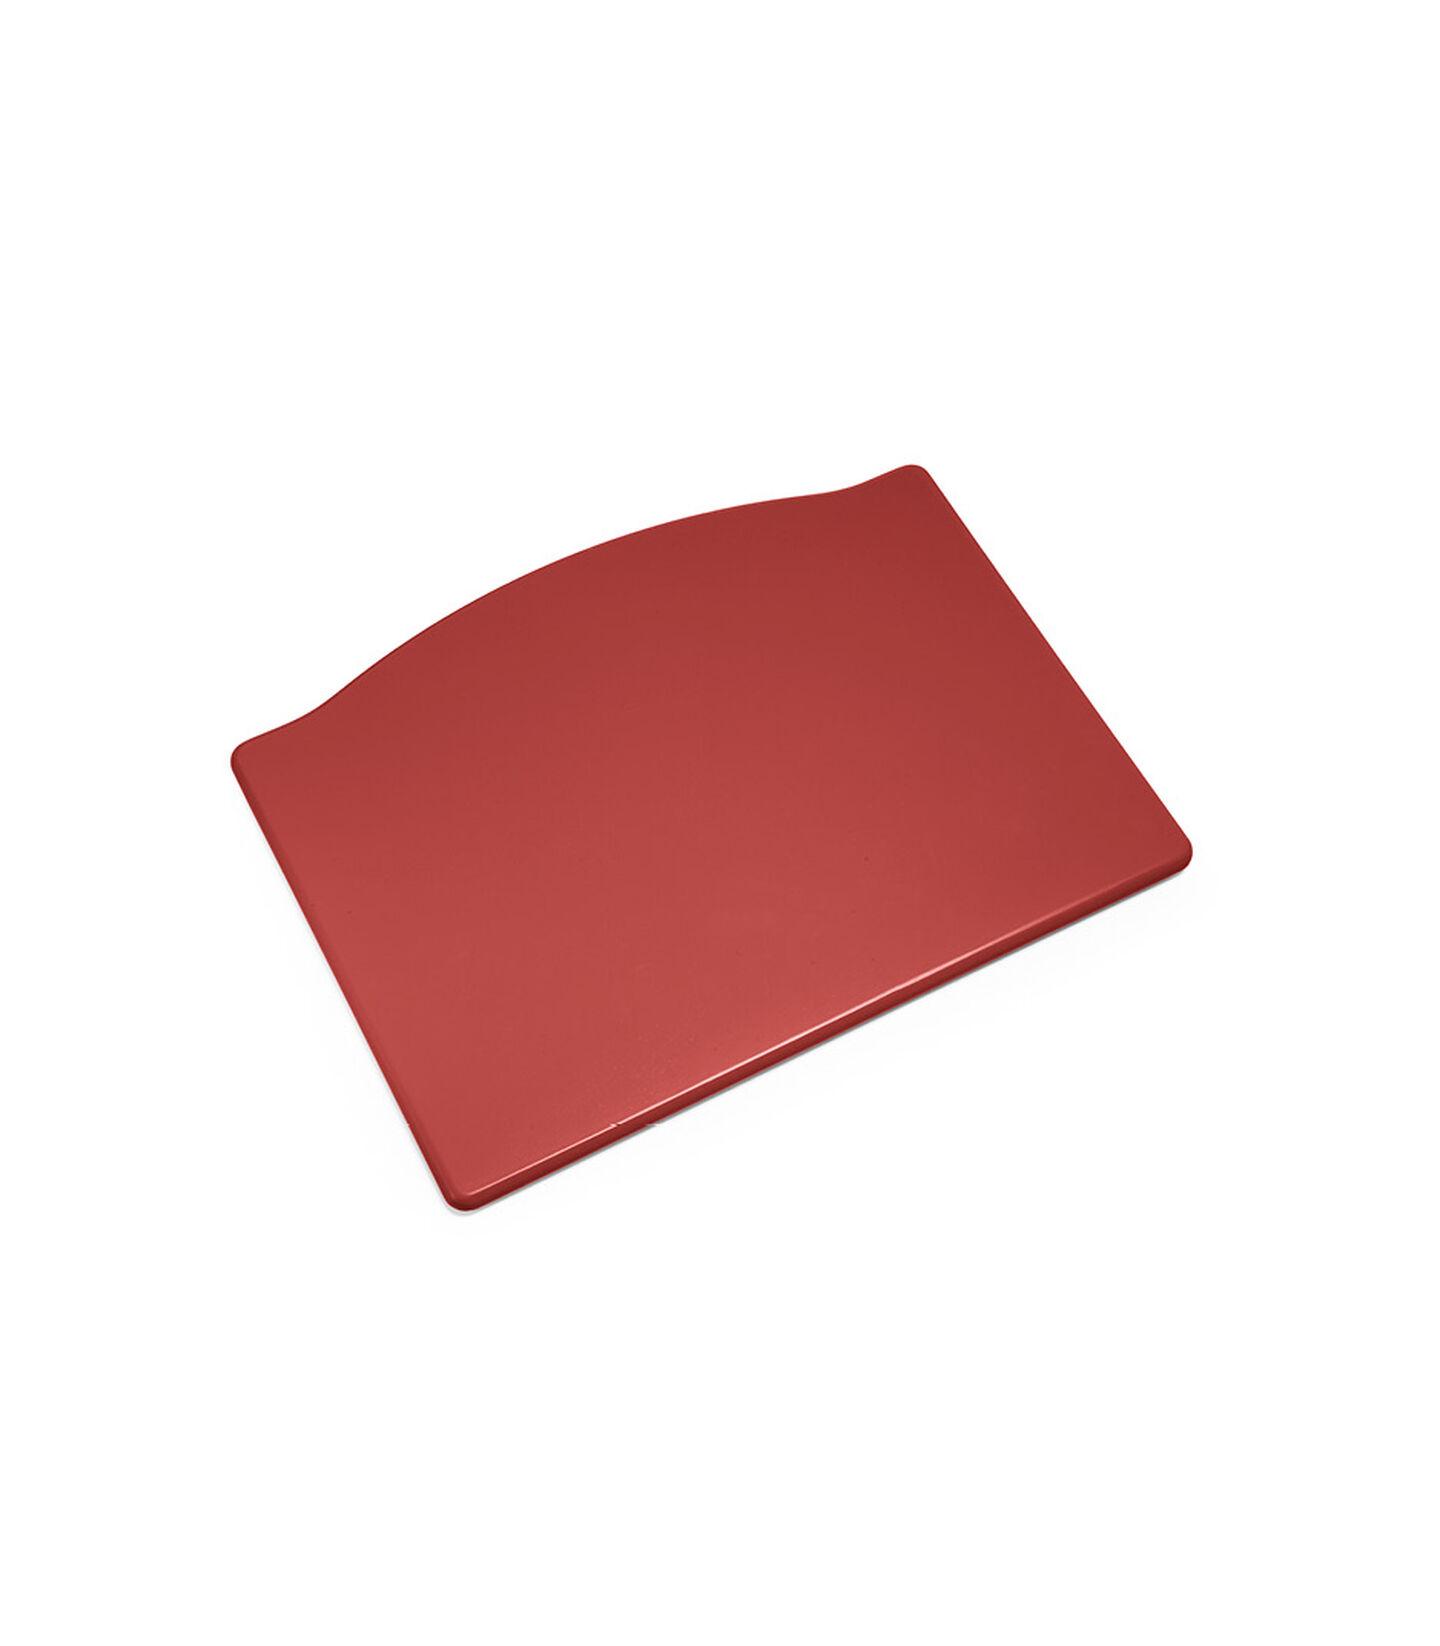 Tripp Trapp® Footplate Rojo cálido, Rojo cálido, mainview view 2